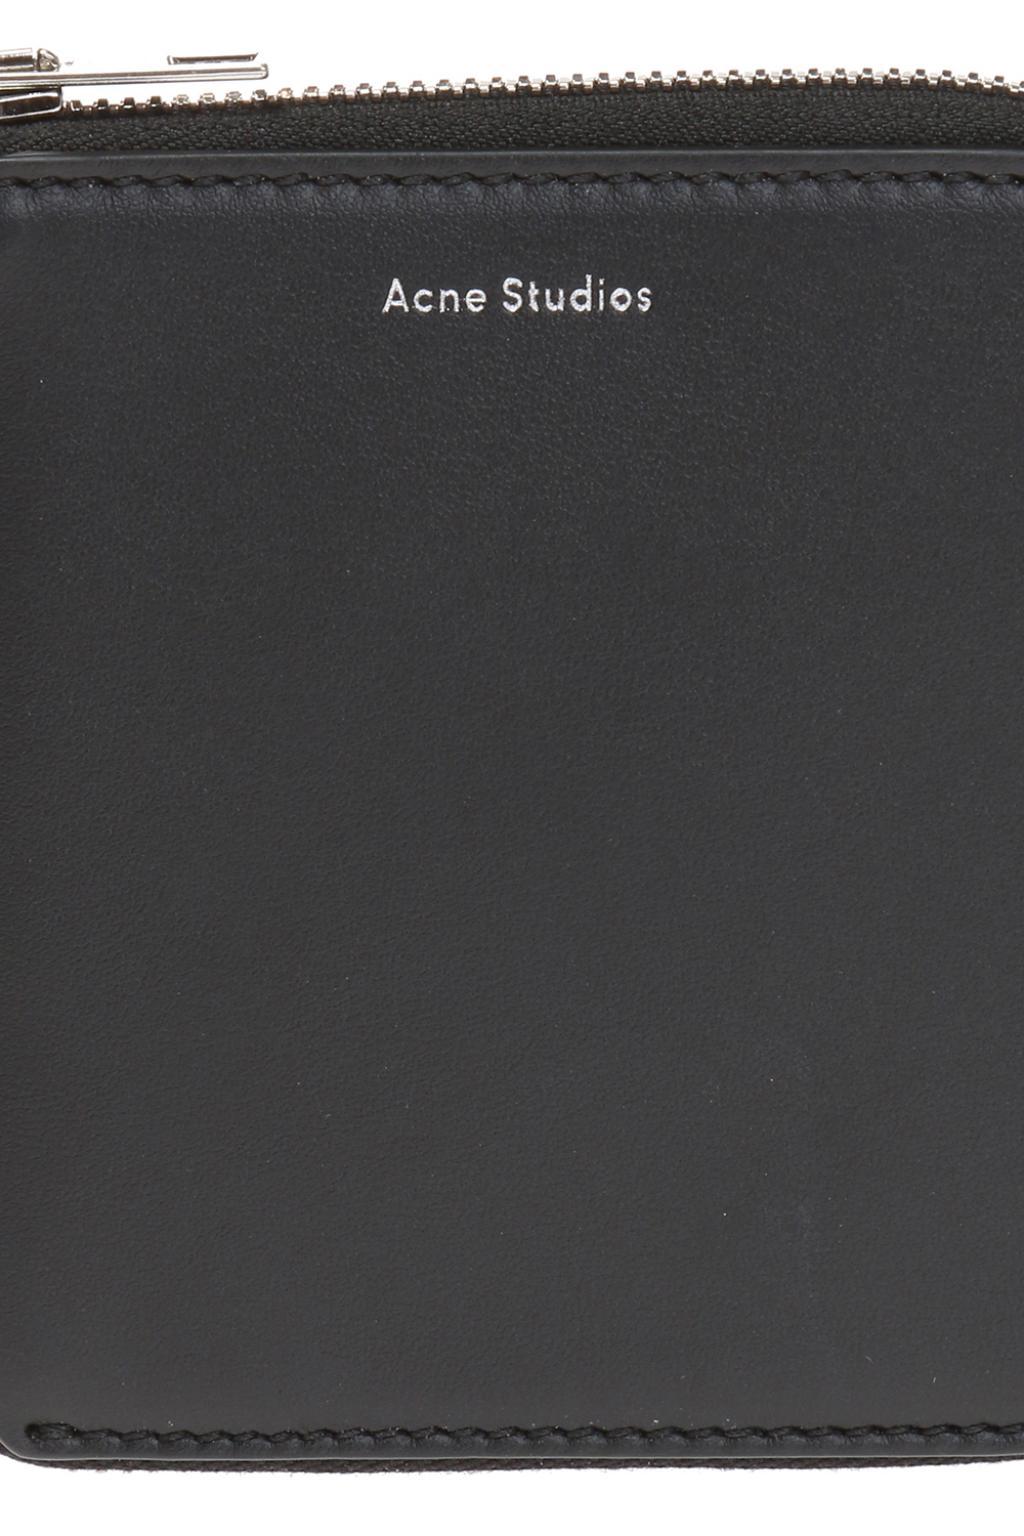 Acne Studios 'Csarite S' wallet with logo